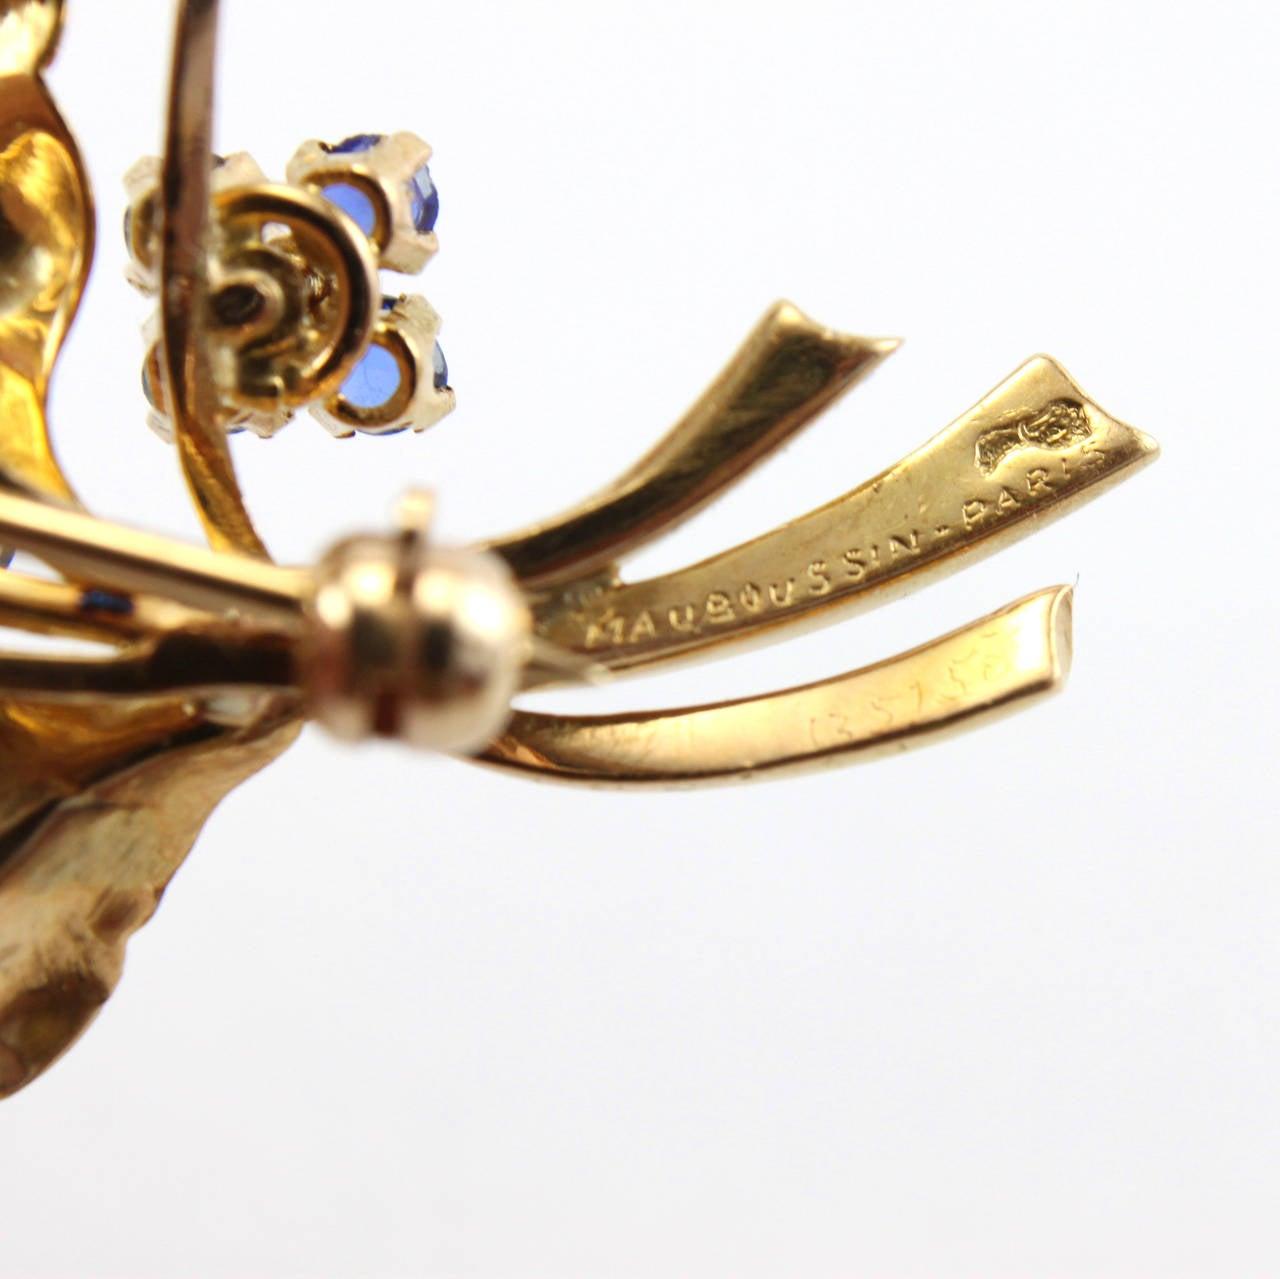 1948 Mauboussin Ruby Sapphire Diamond Flower Brooch or Pendant 3